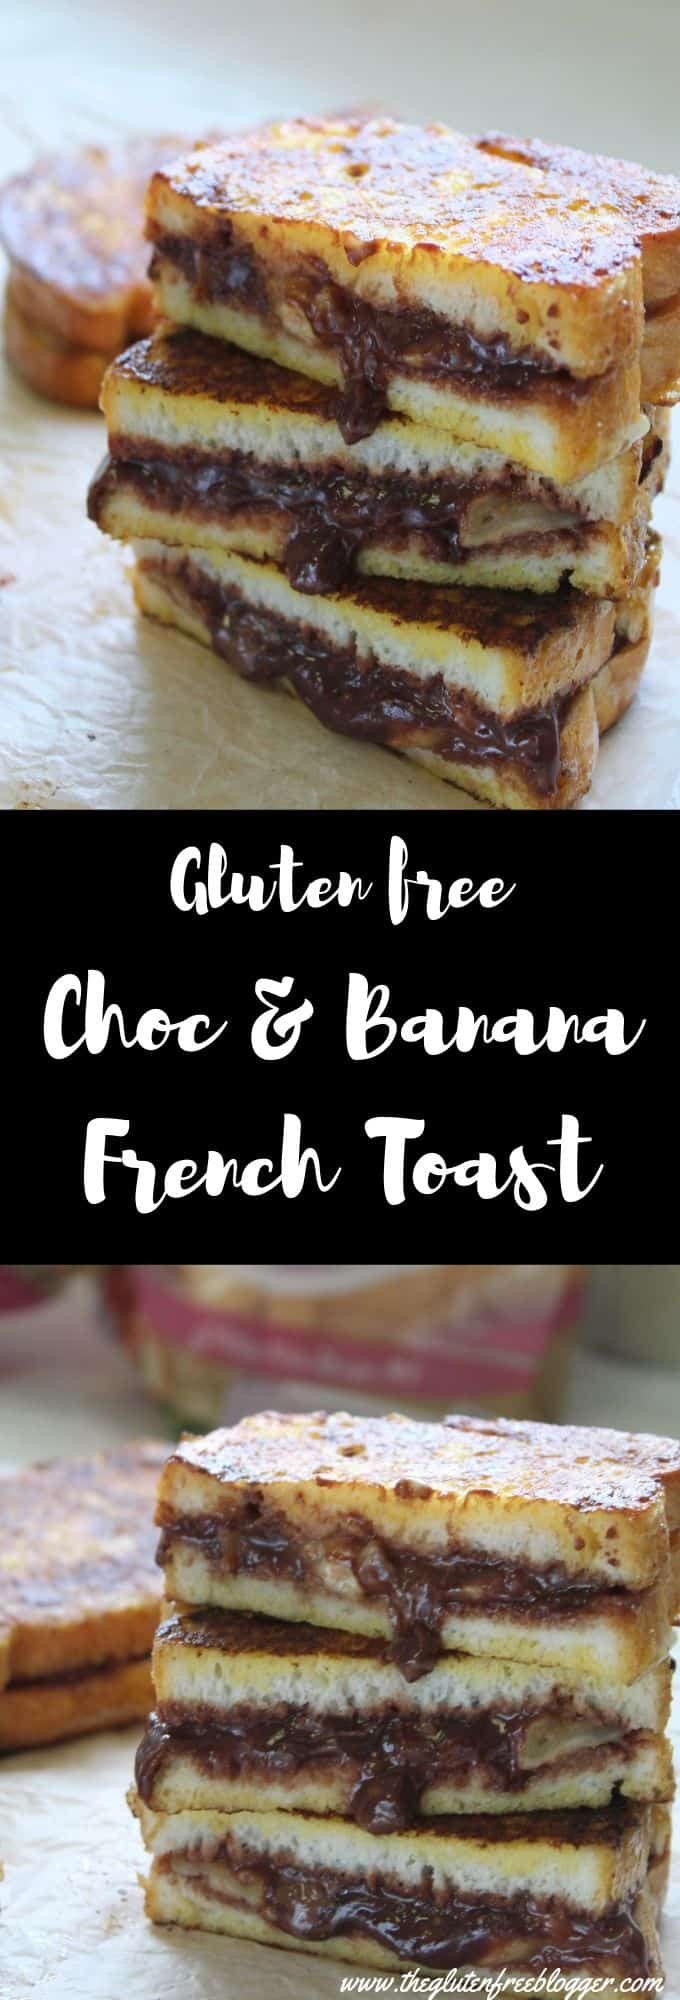 gluten free chocolate and banana french toast recipe coeliac celiac brunch